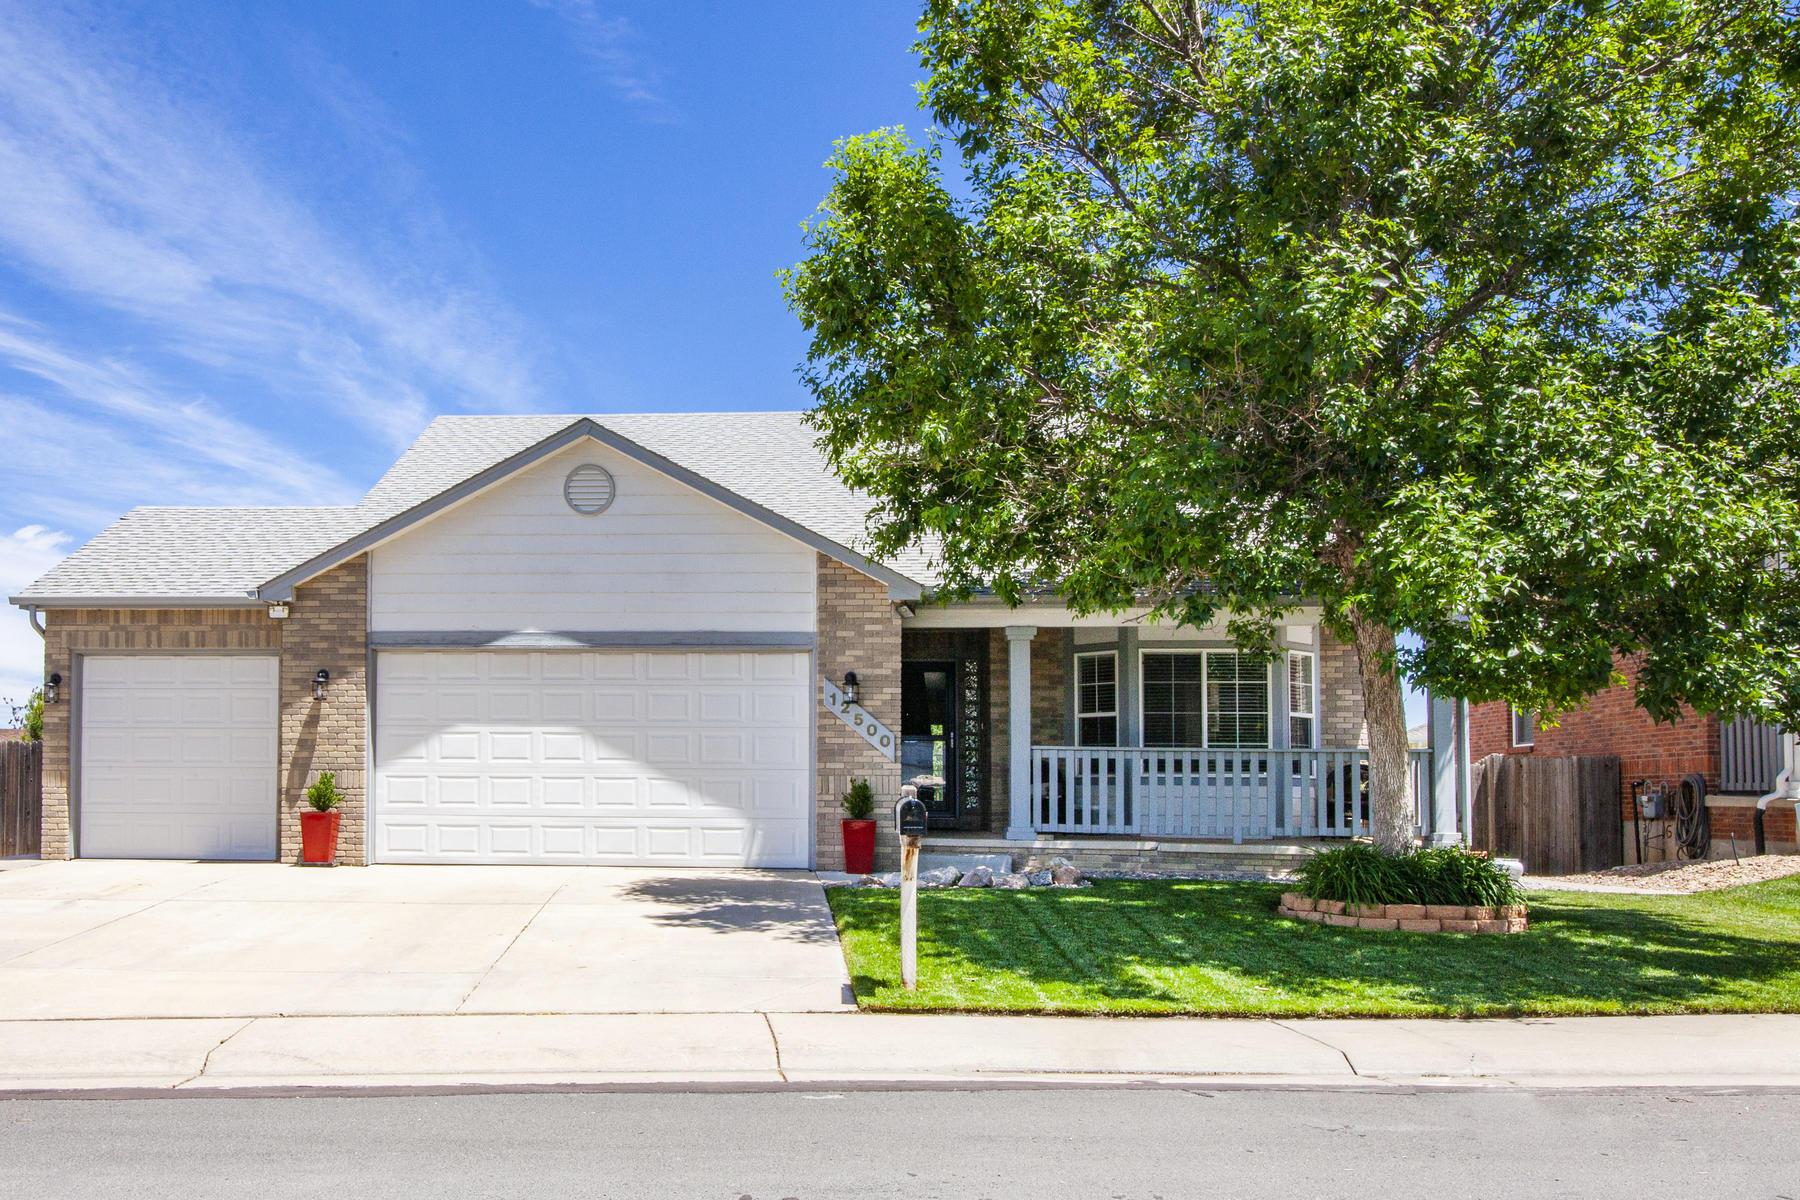 Single Family Homes для того Продажа на Rare Semi-Custom Ranch Home 12500 Josephine Street, Thornton, Колорадо 80241 Соединенные Штаты